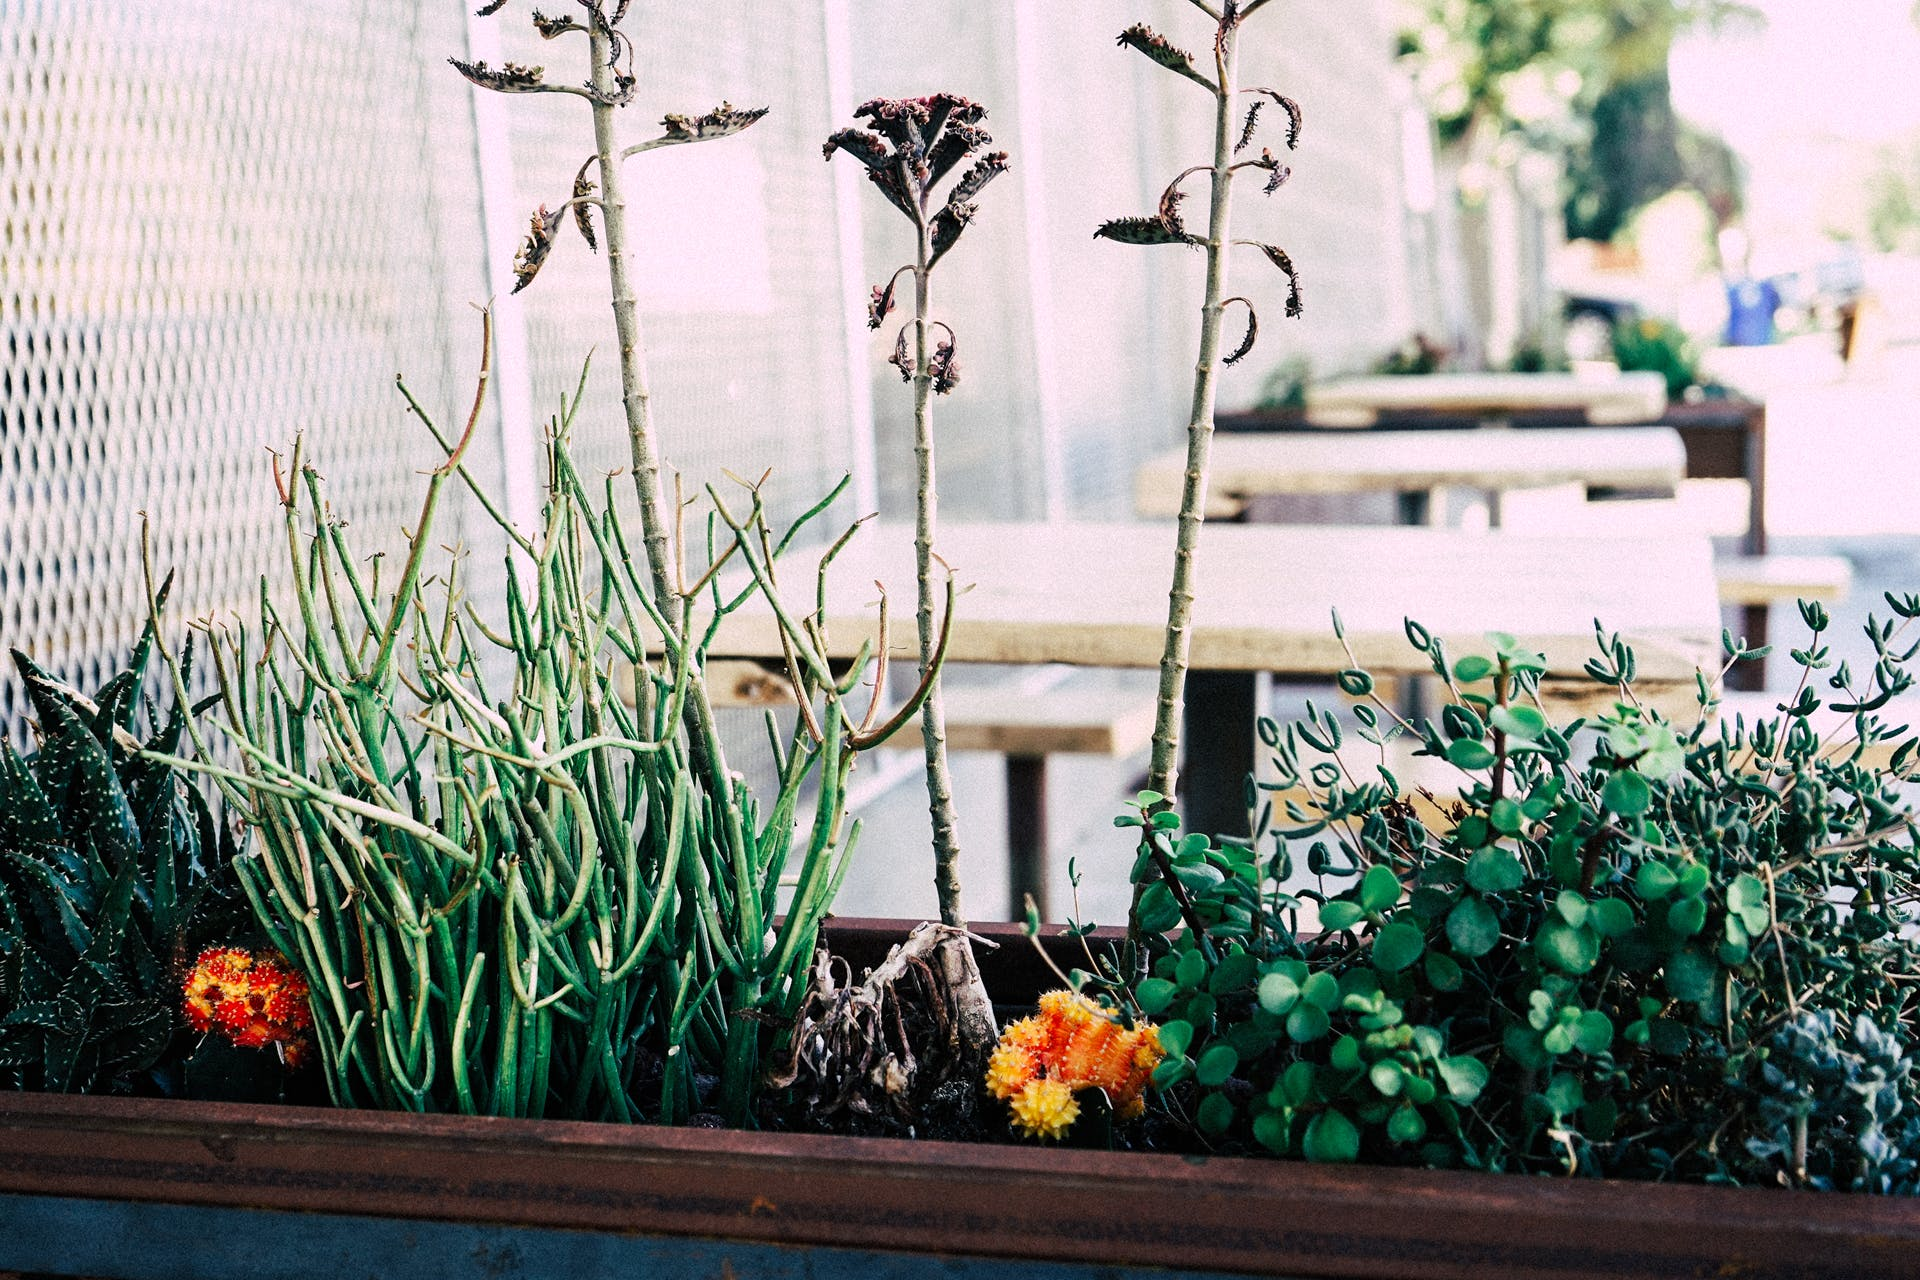 daylight, fence, flowerpot